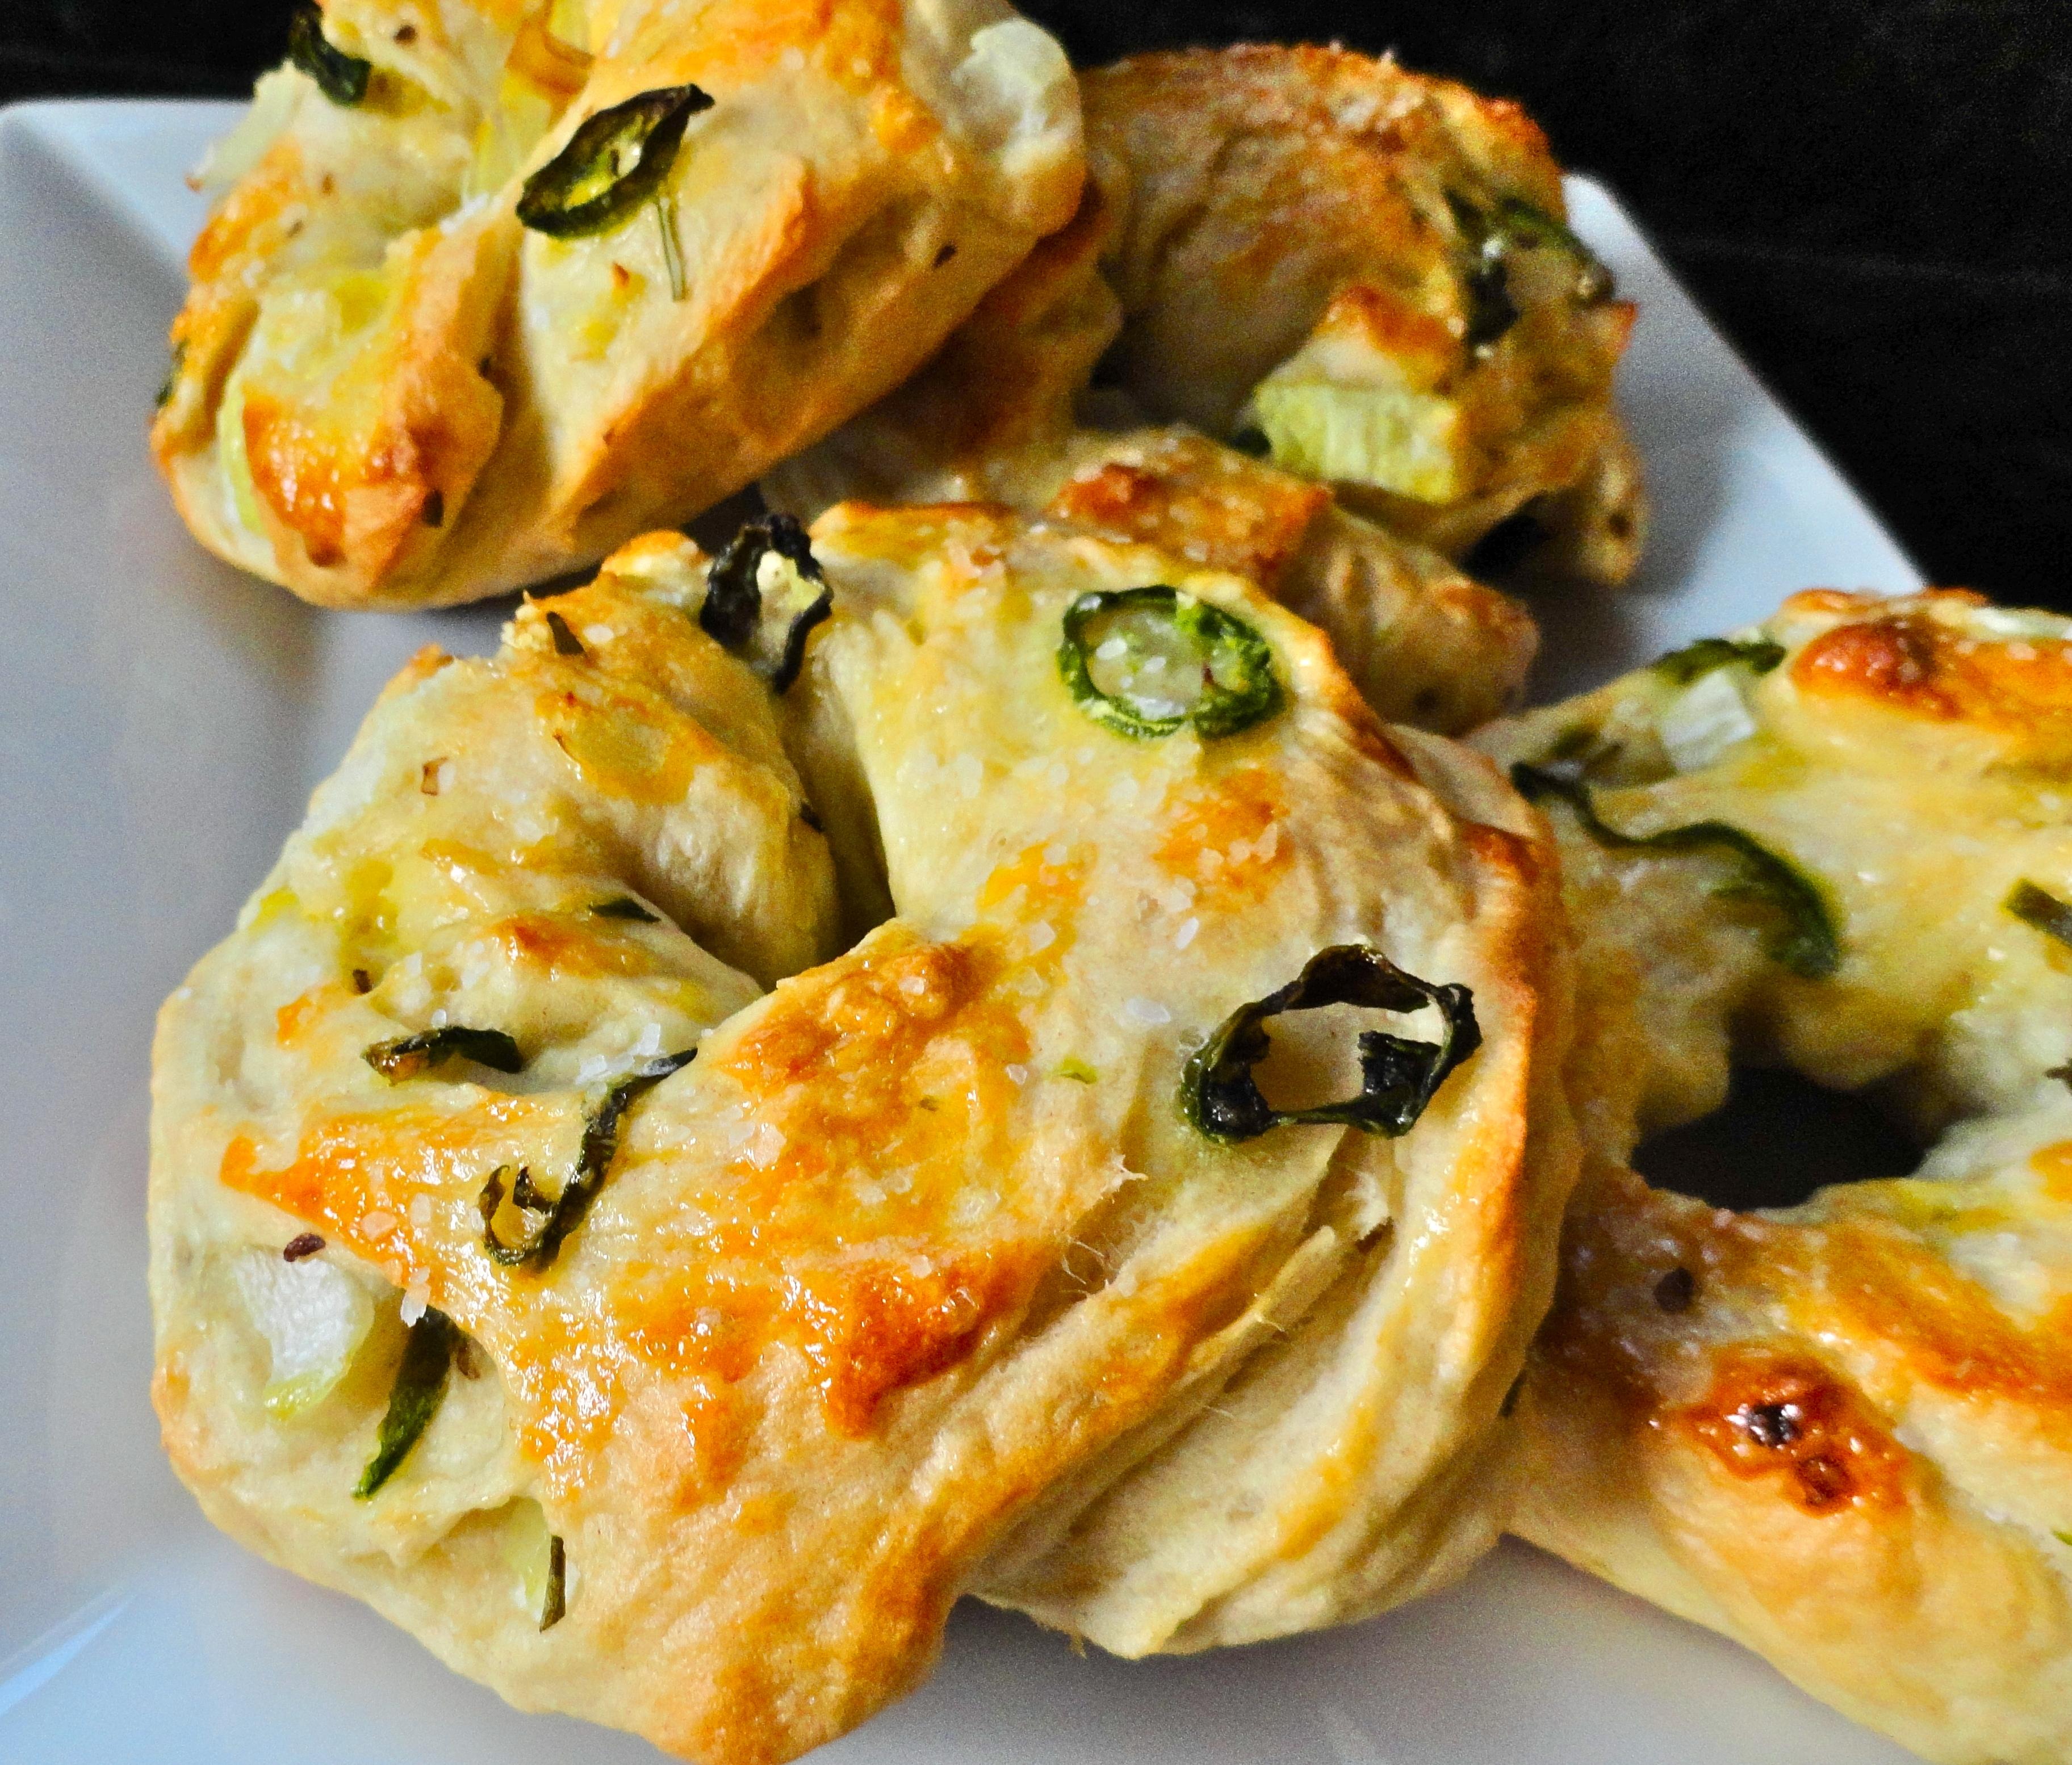 Jalapeno and Onion Bagels | becoming pigzilla